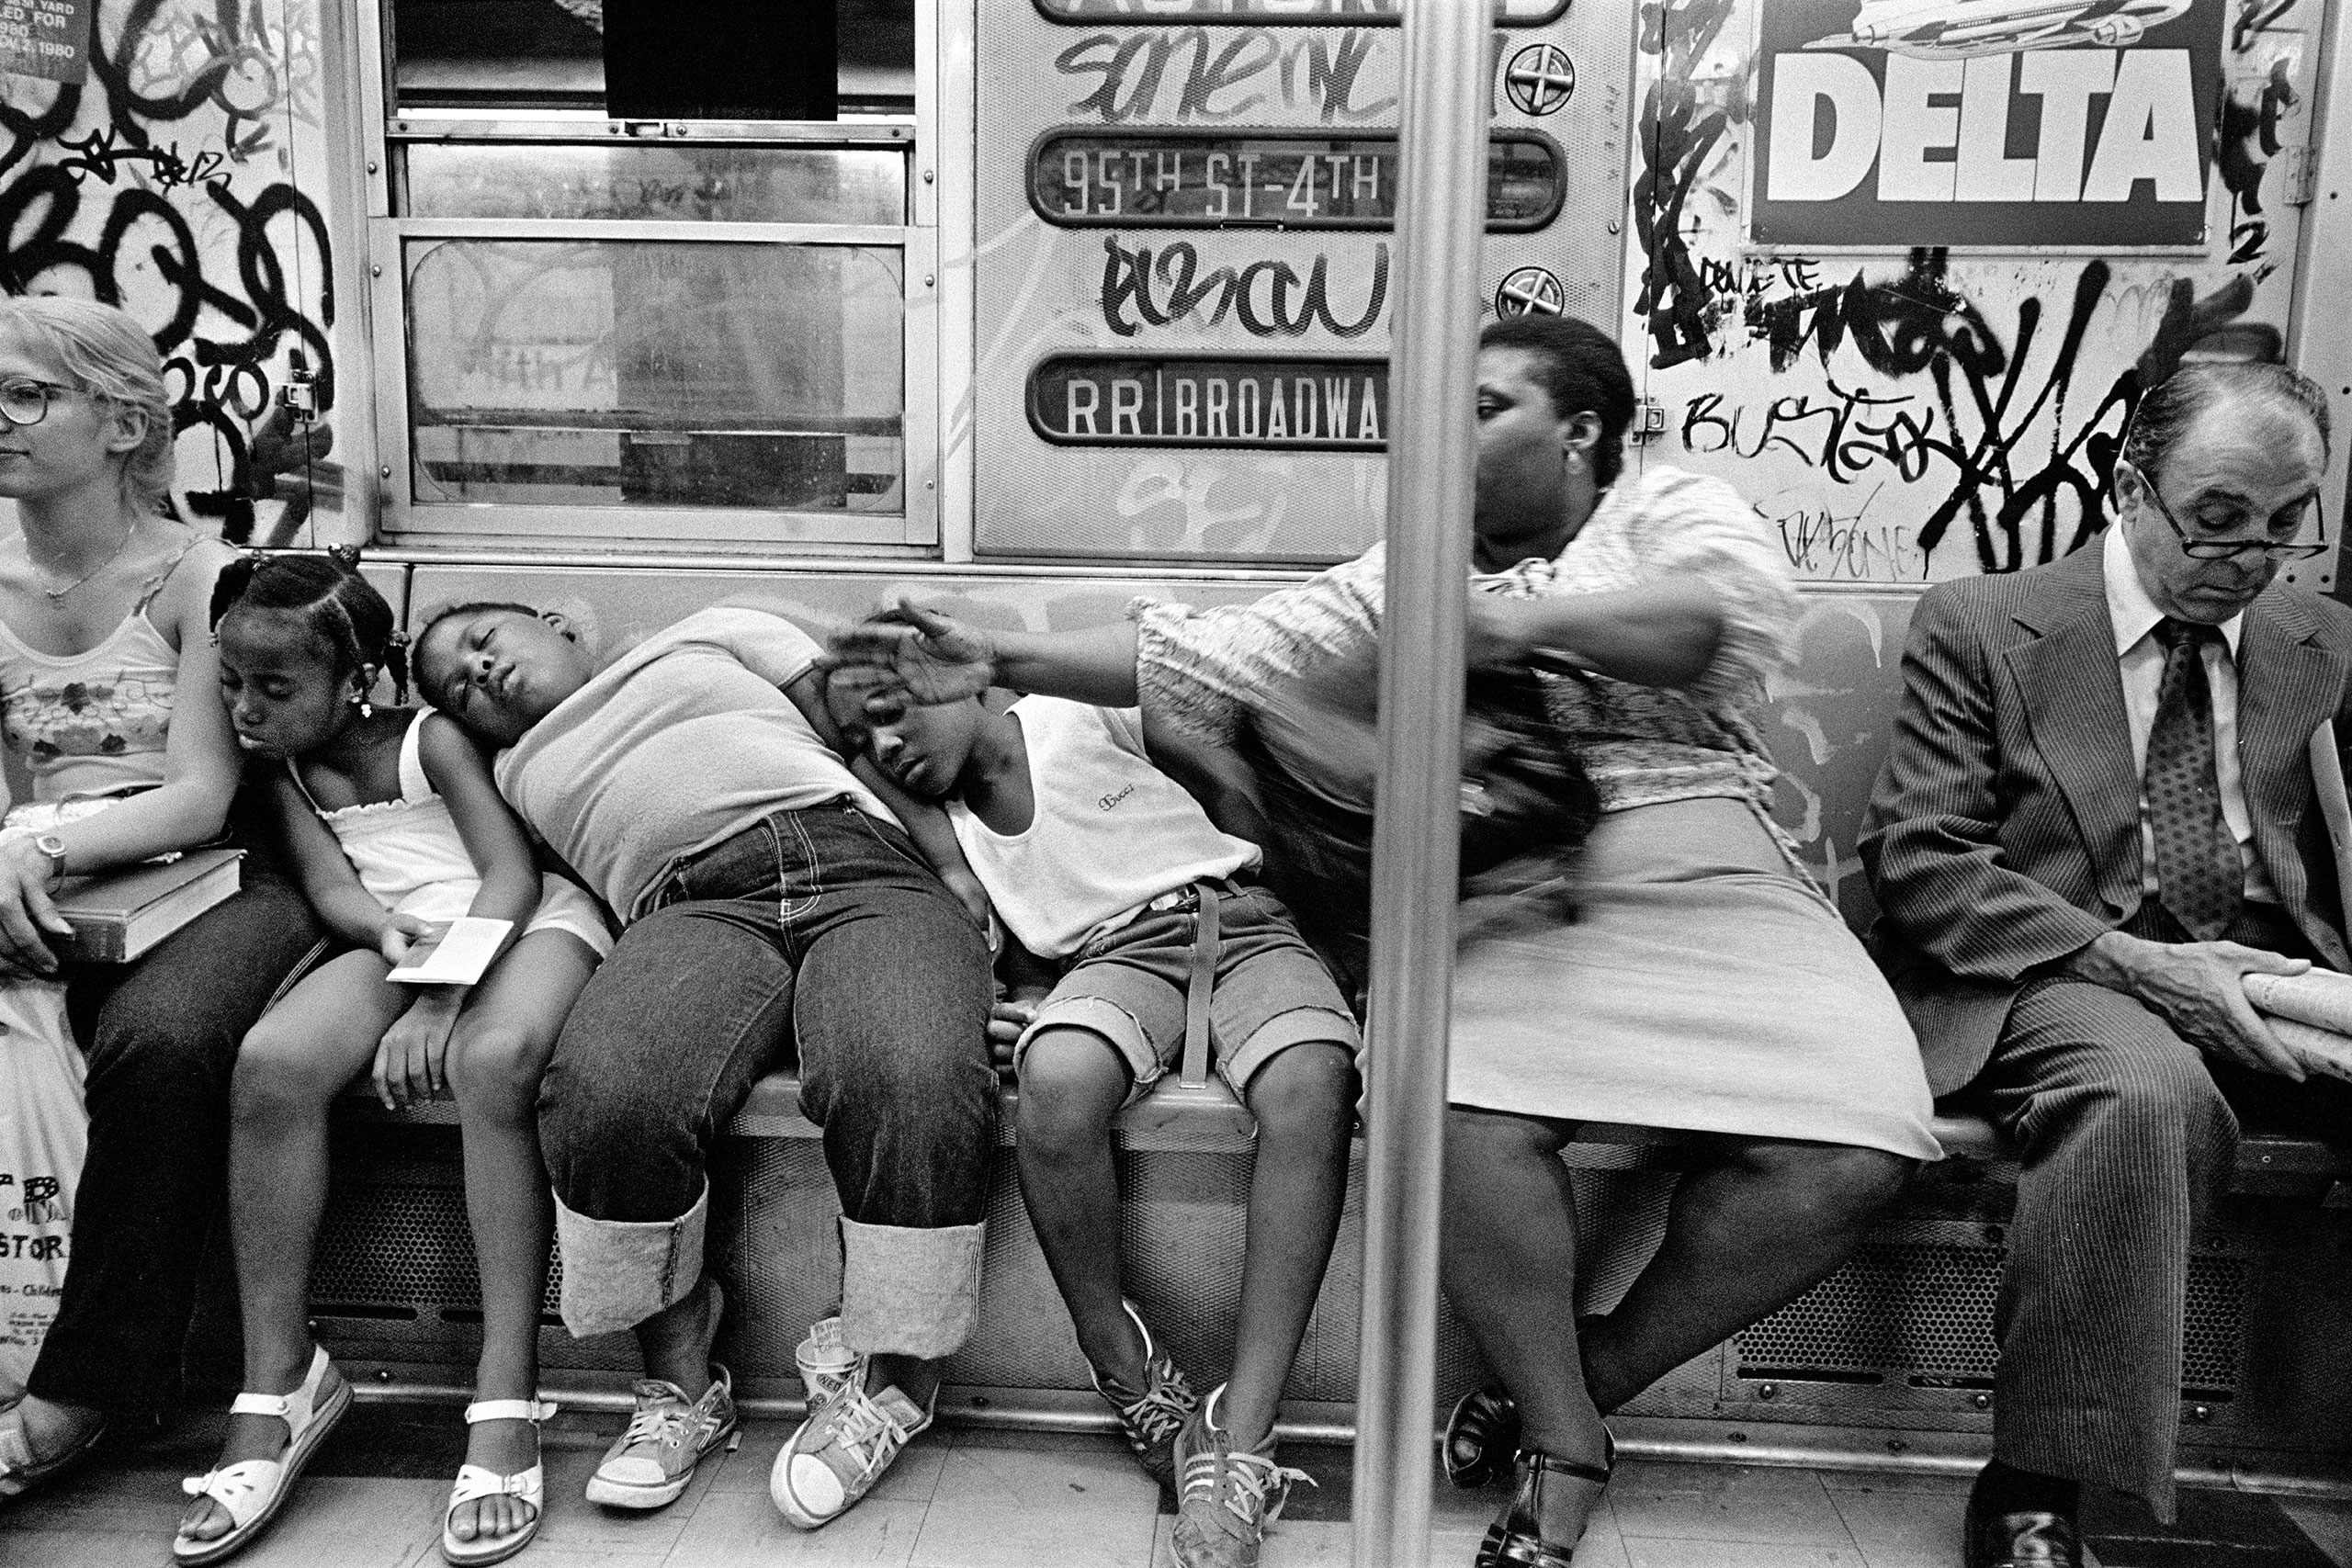 RR Train, NYC, 1982